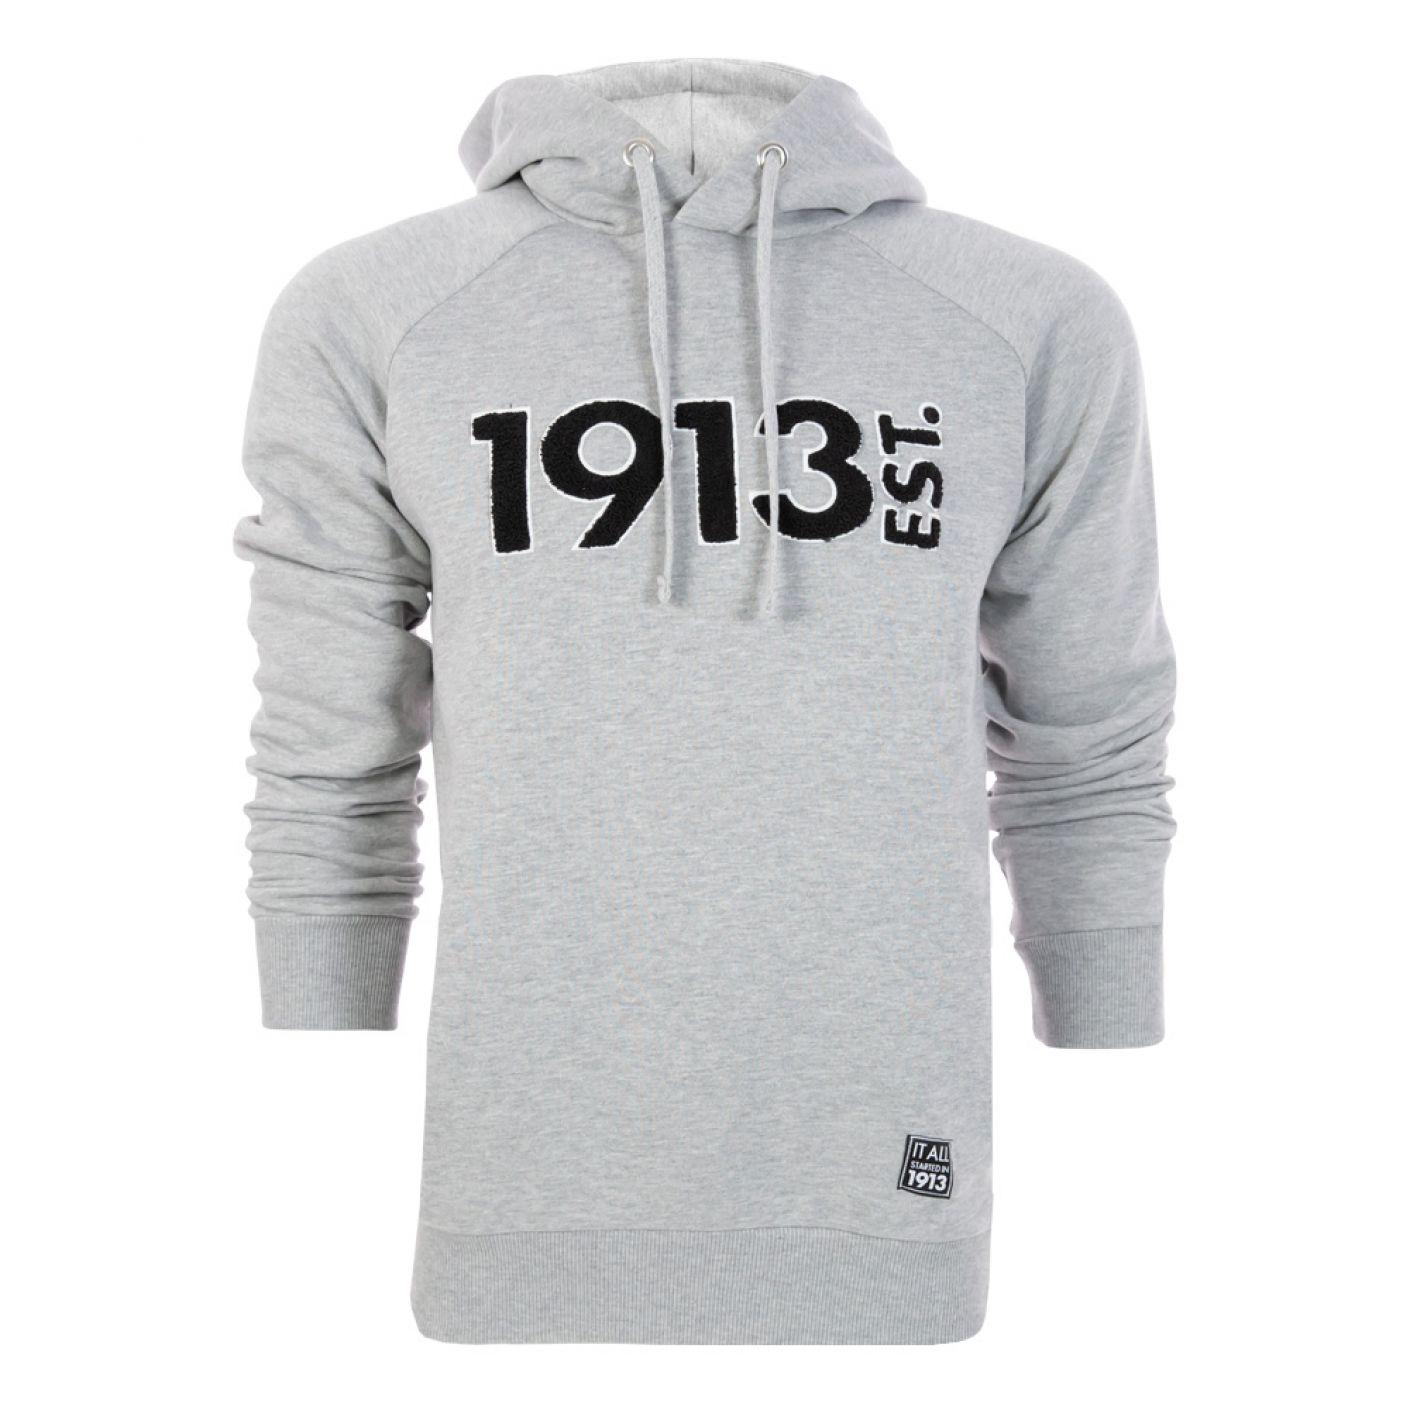 1913 Hooded Sweater Terry grijs